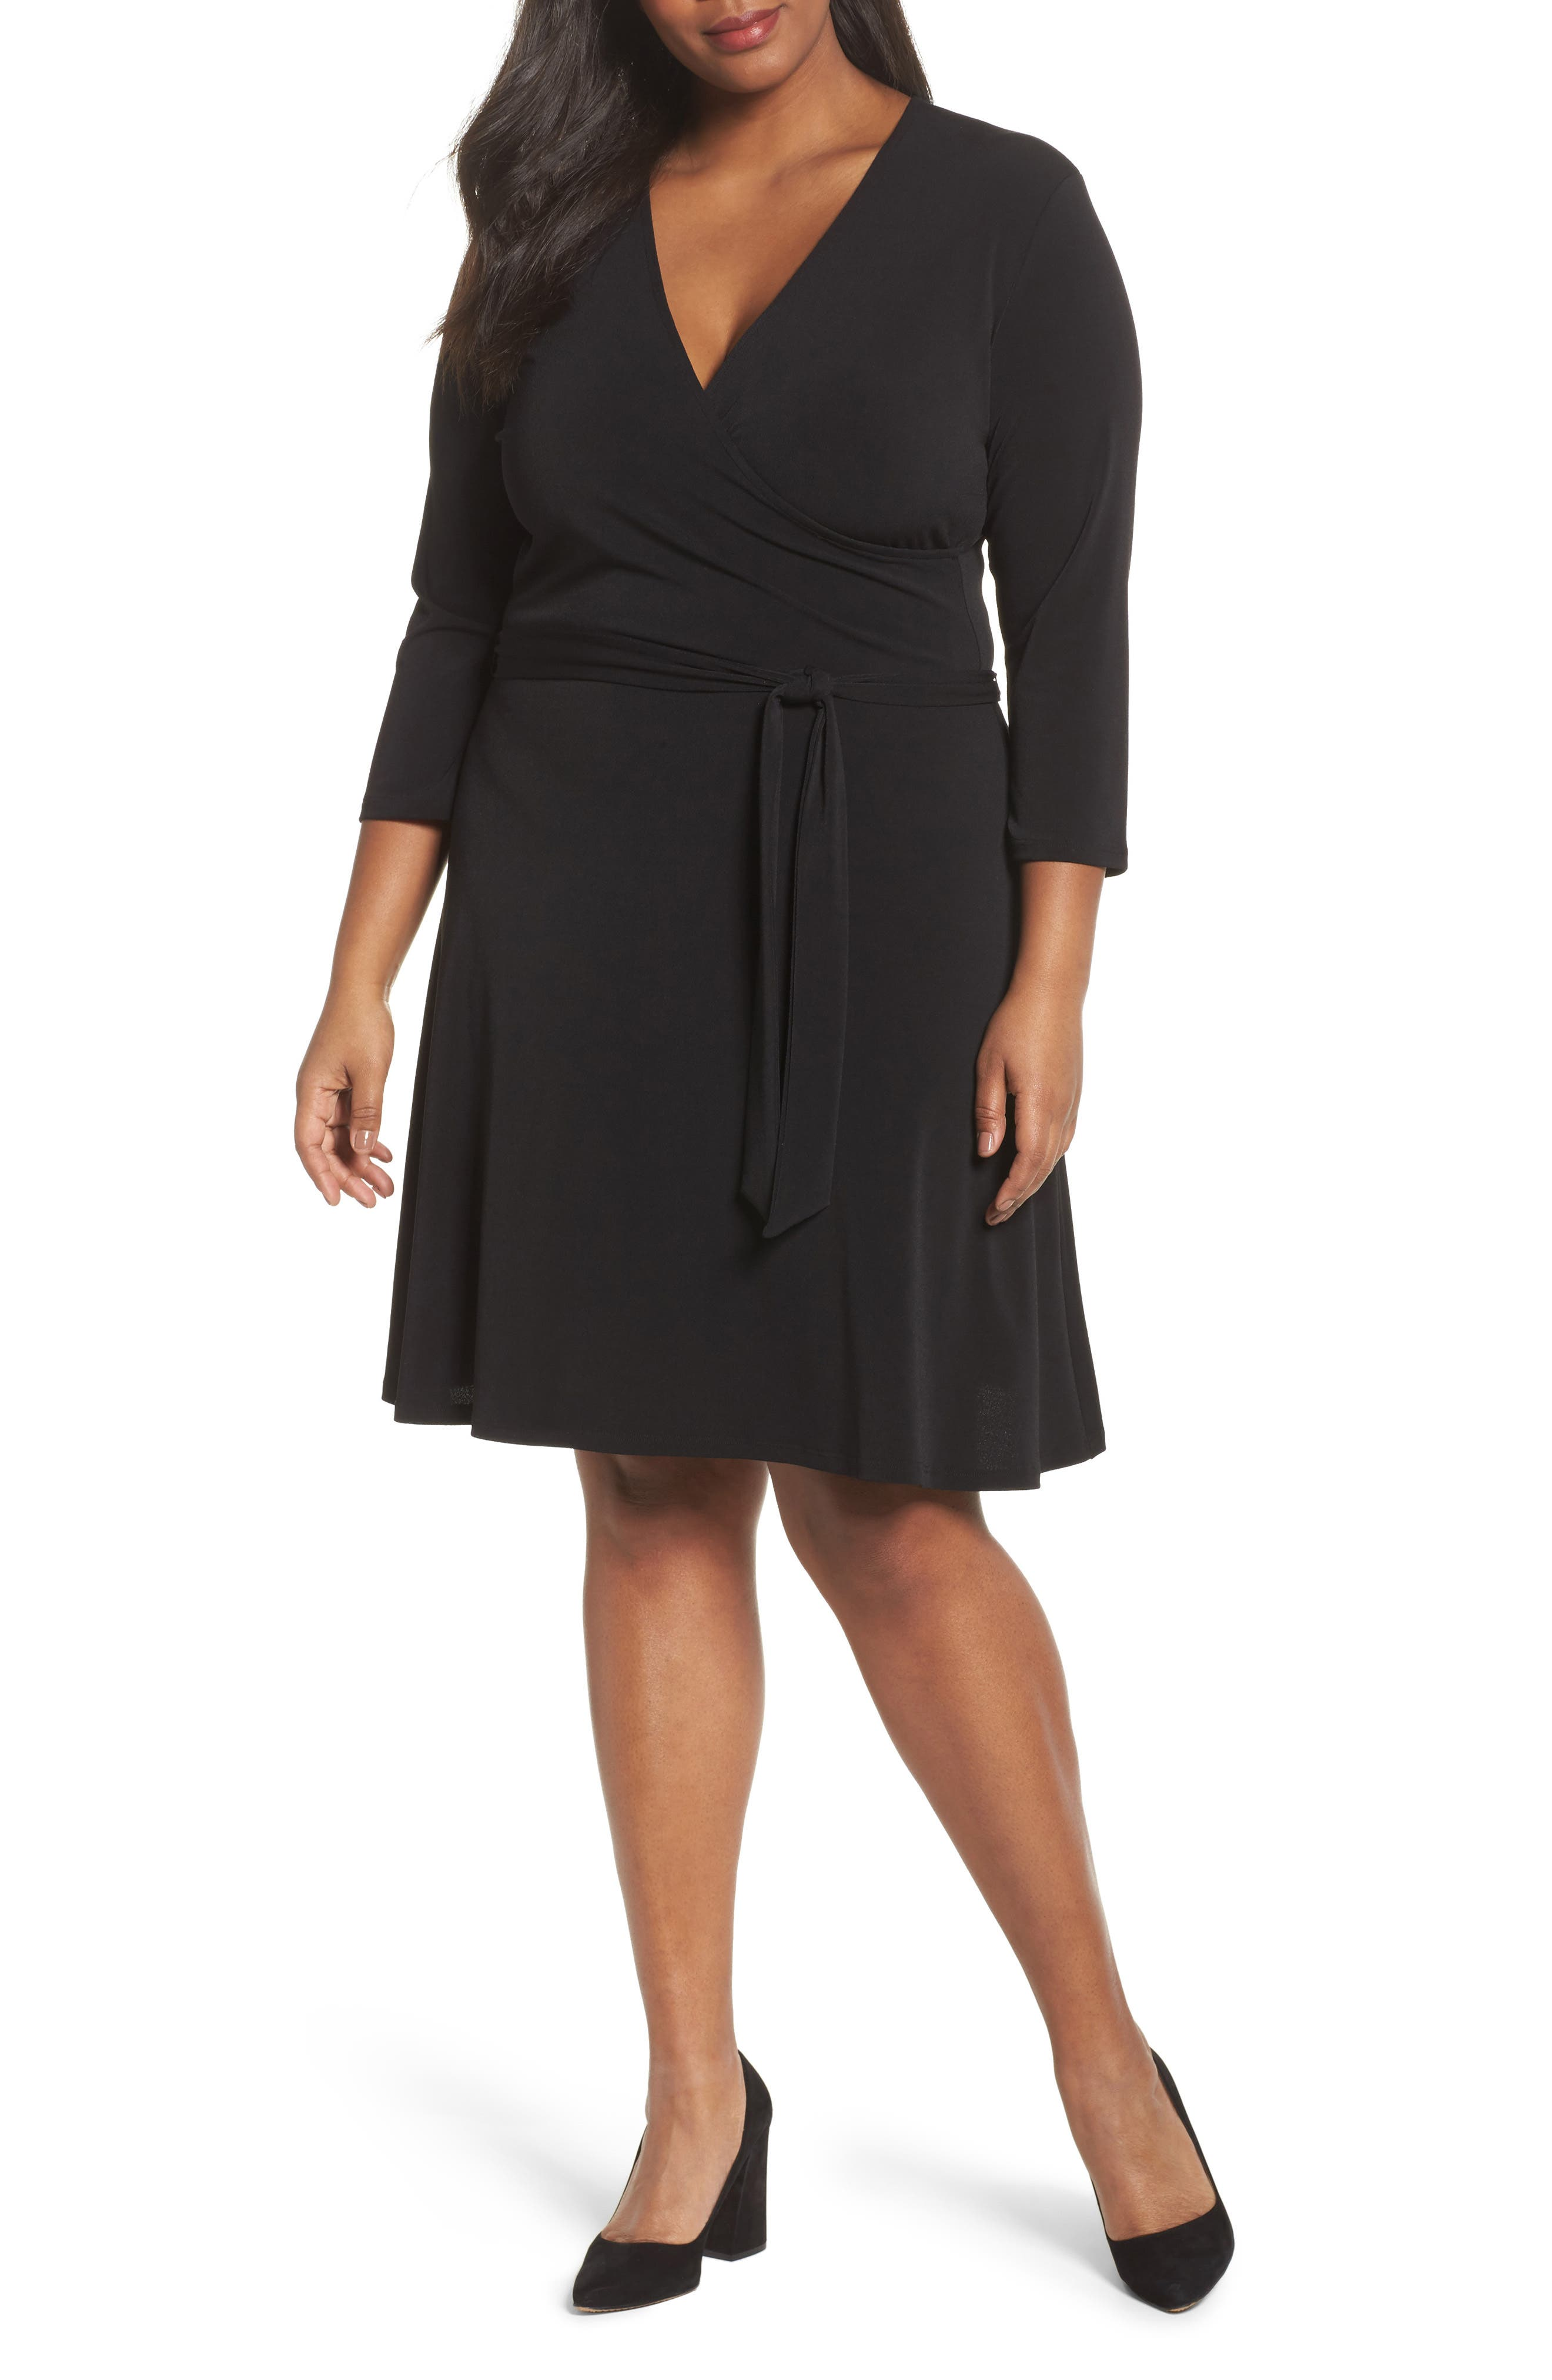 Alternate Image 1 Selected - Leota Wrap Dress (Plus Size)